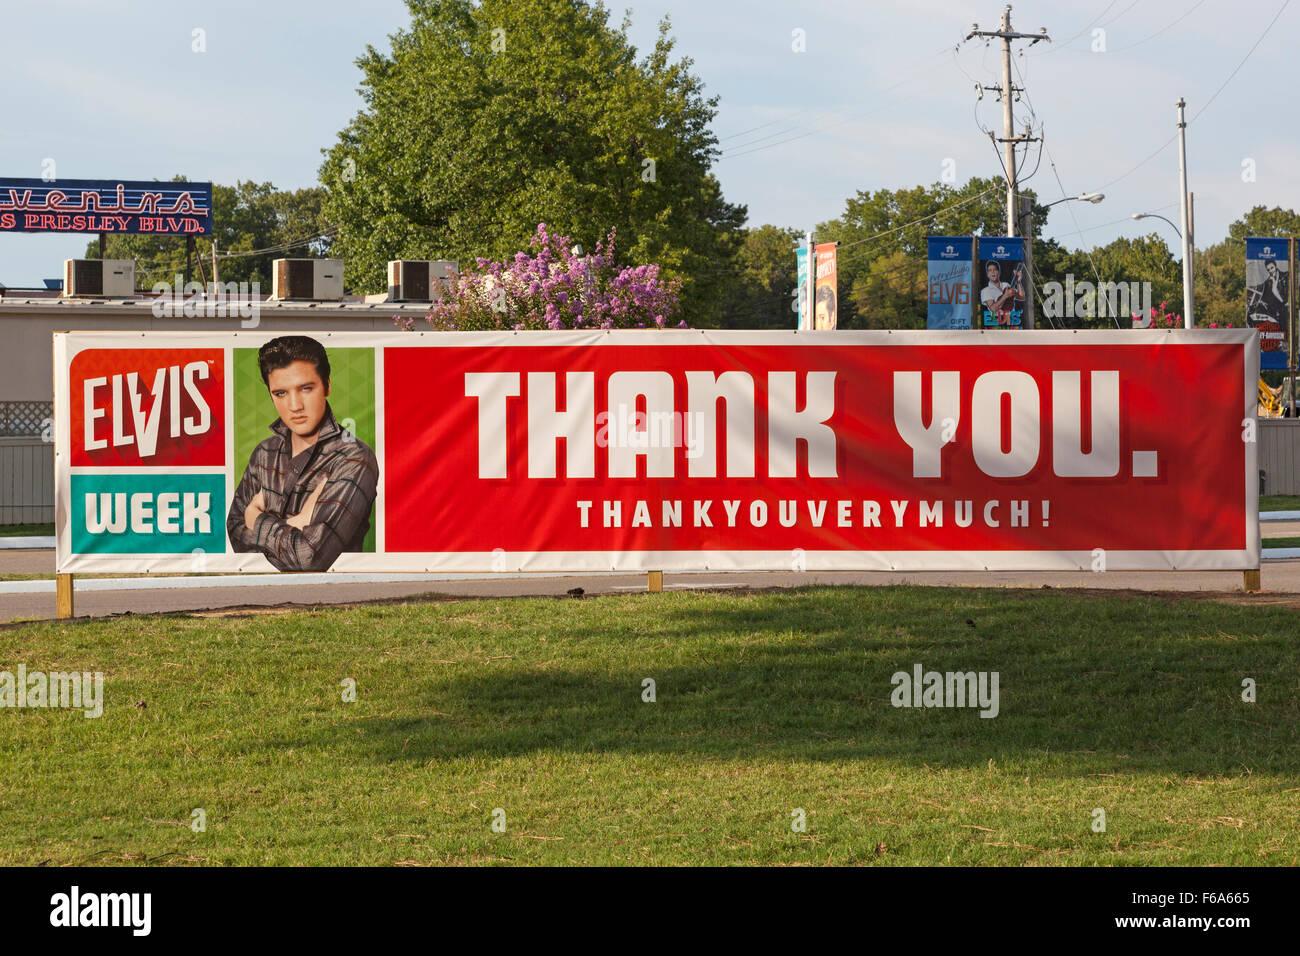 Danke vielmals, Elvis Week 2015, Graceland, Memphis Tennessee Stockbild